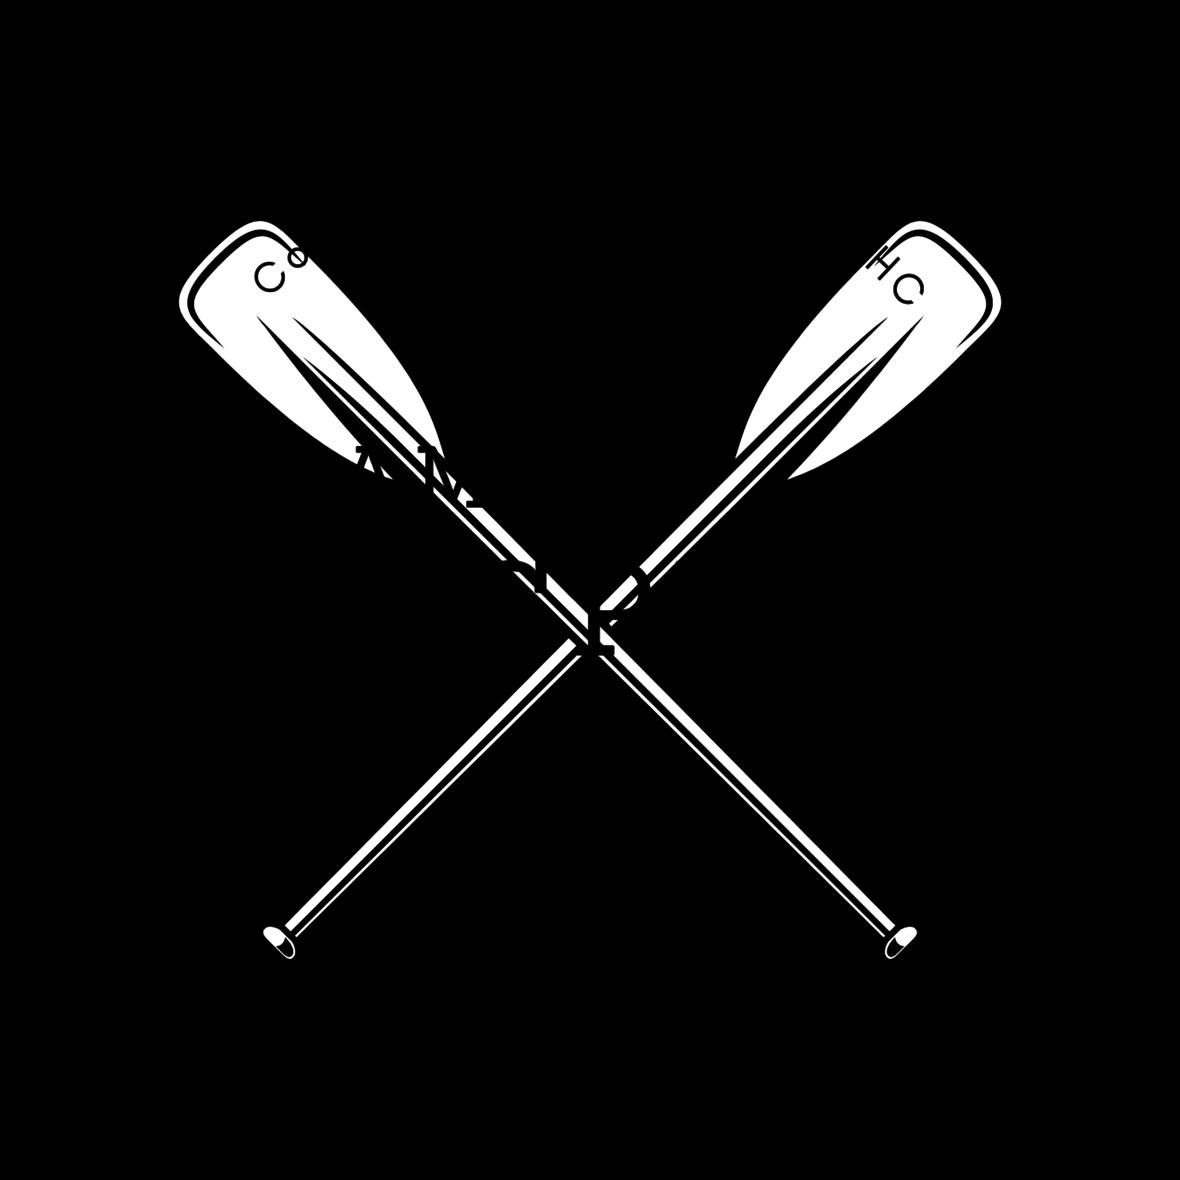 2021 Round camp logo-5